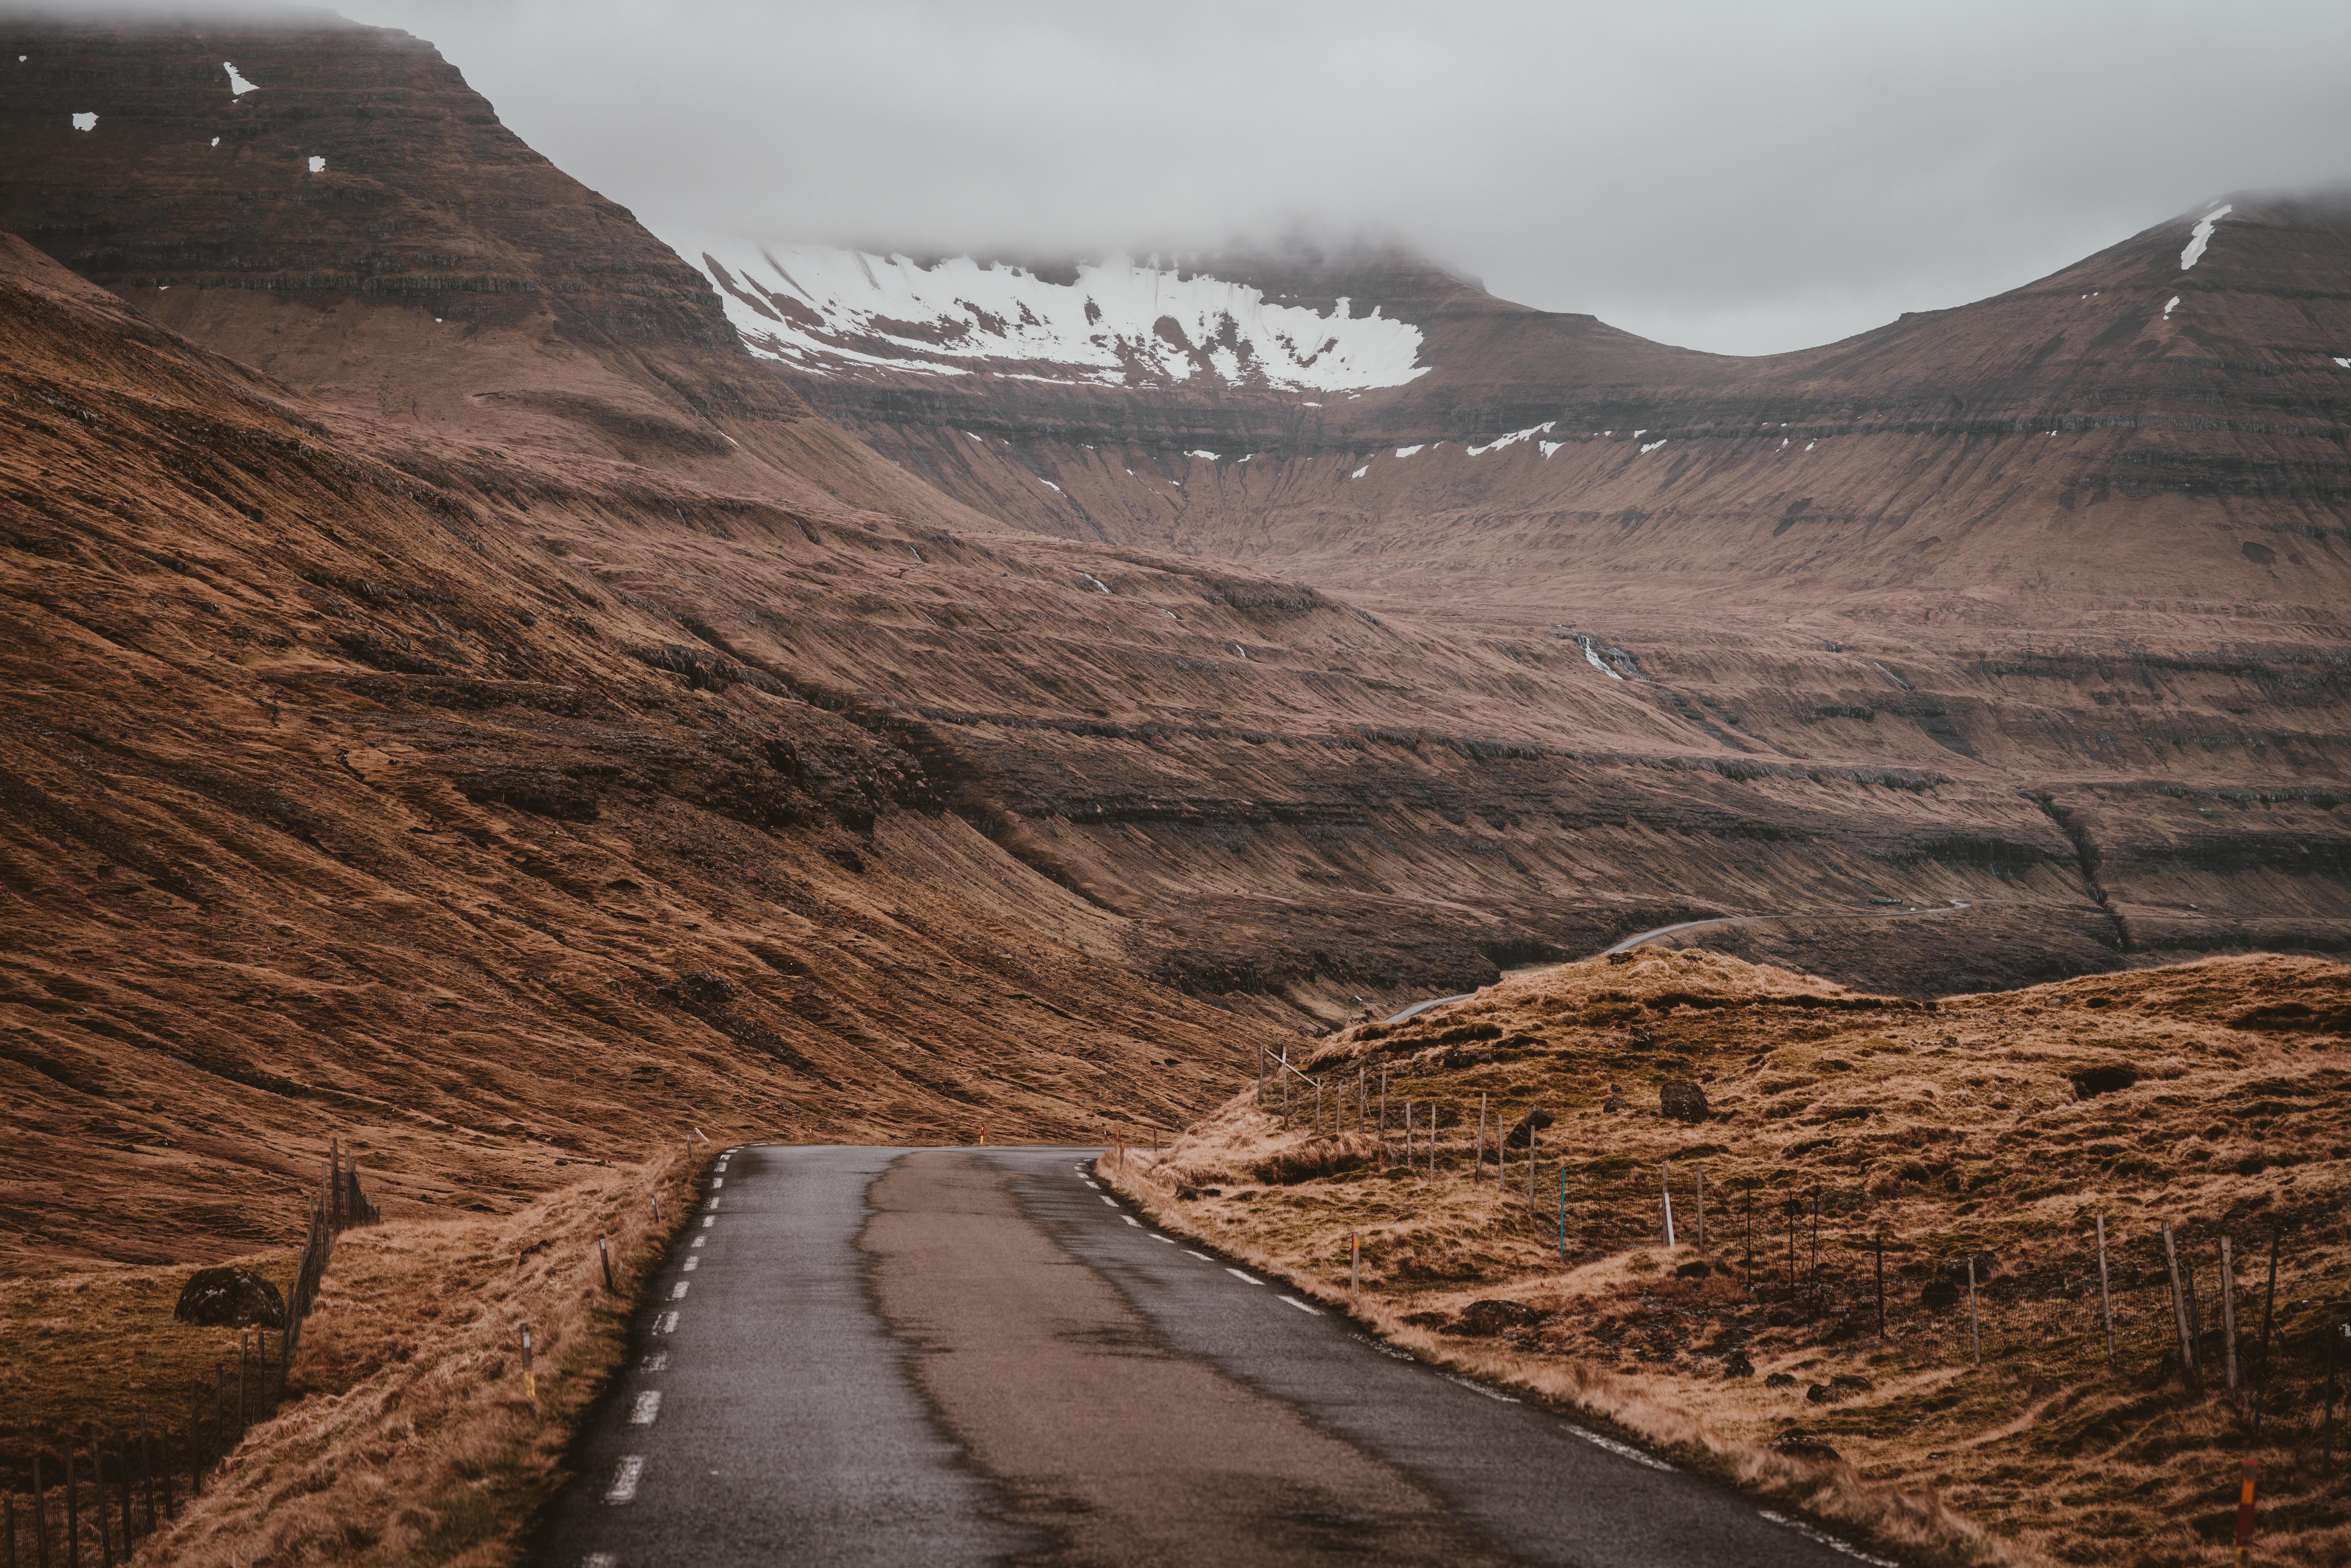 road in between brown mountains